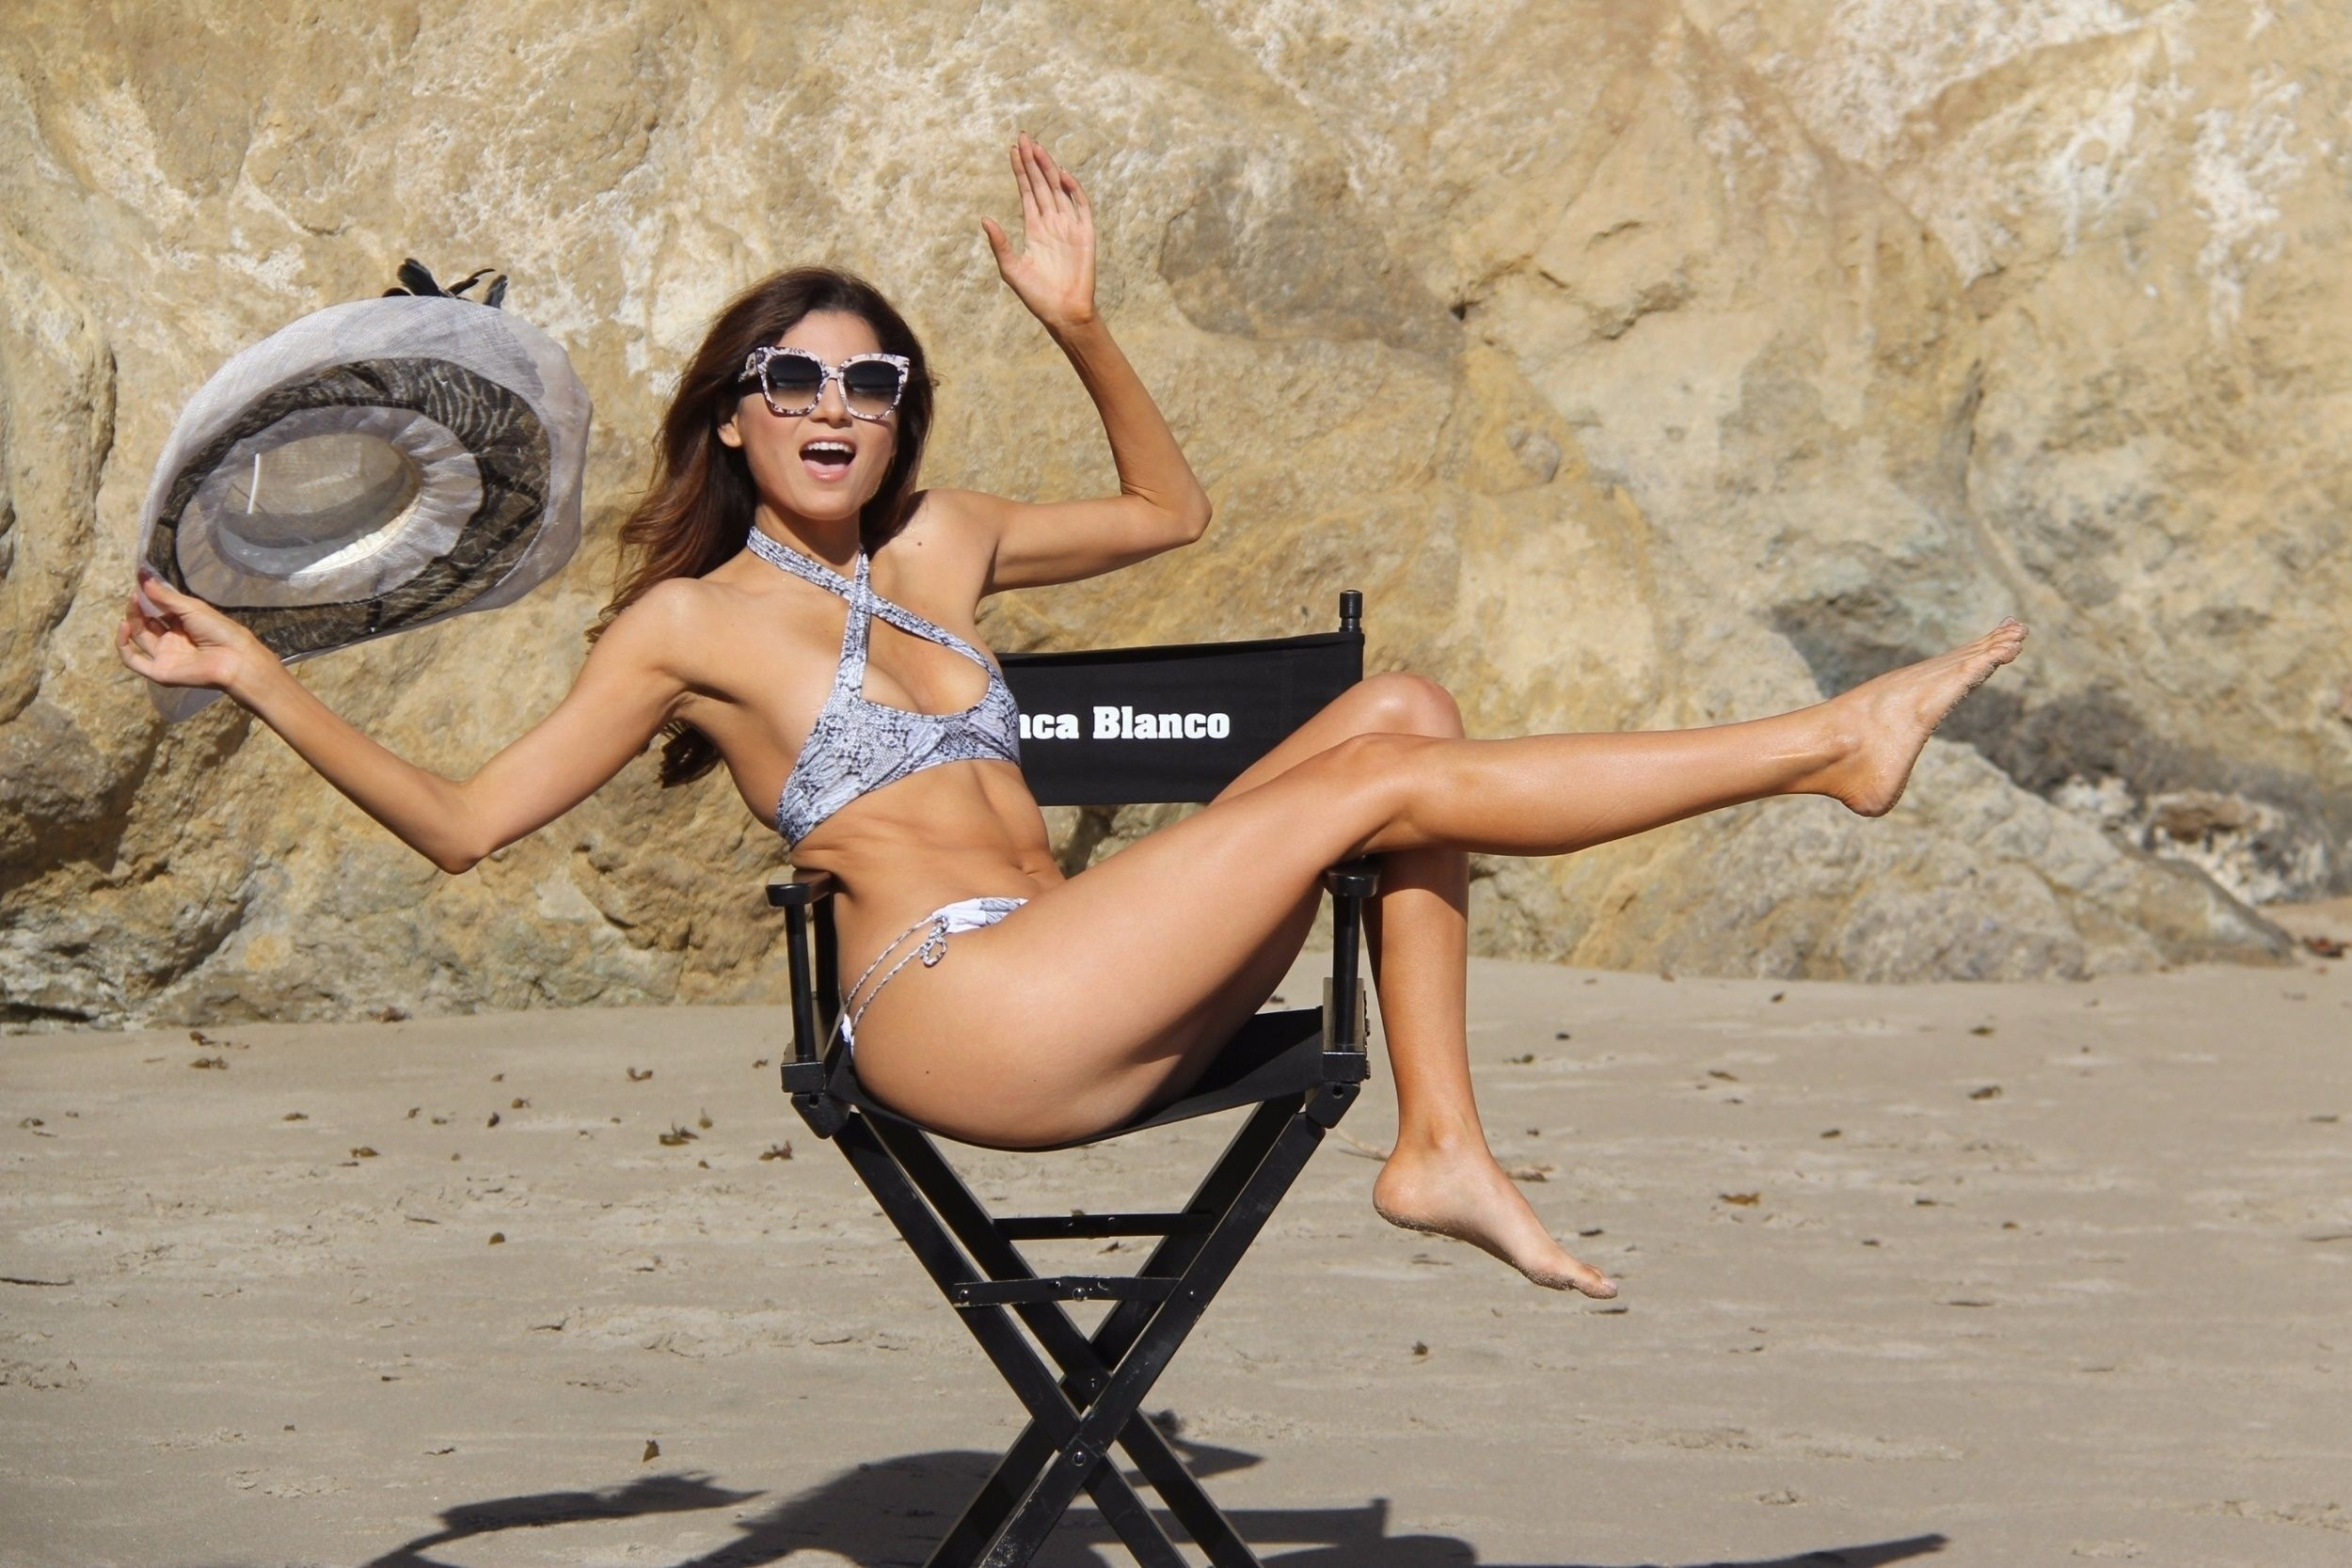 Feet Blanca Blanco nudes (78 foto and video), Tits, Cleavage, Boobs, legs 2017